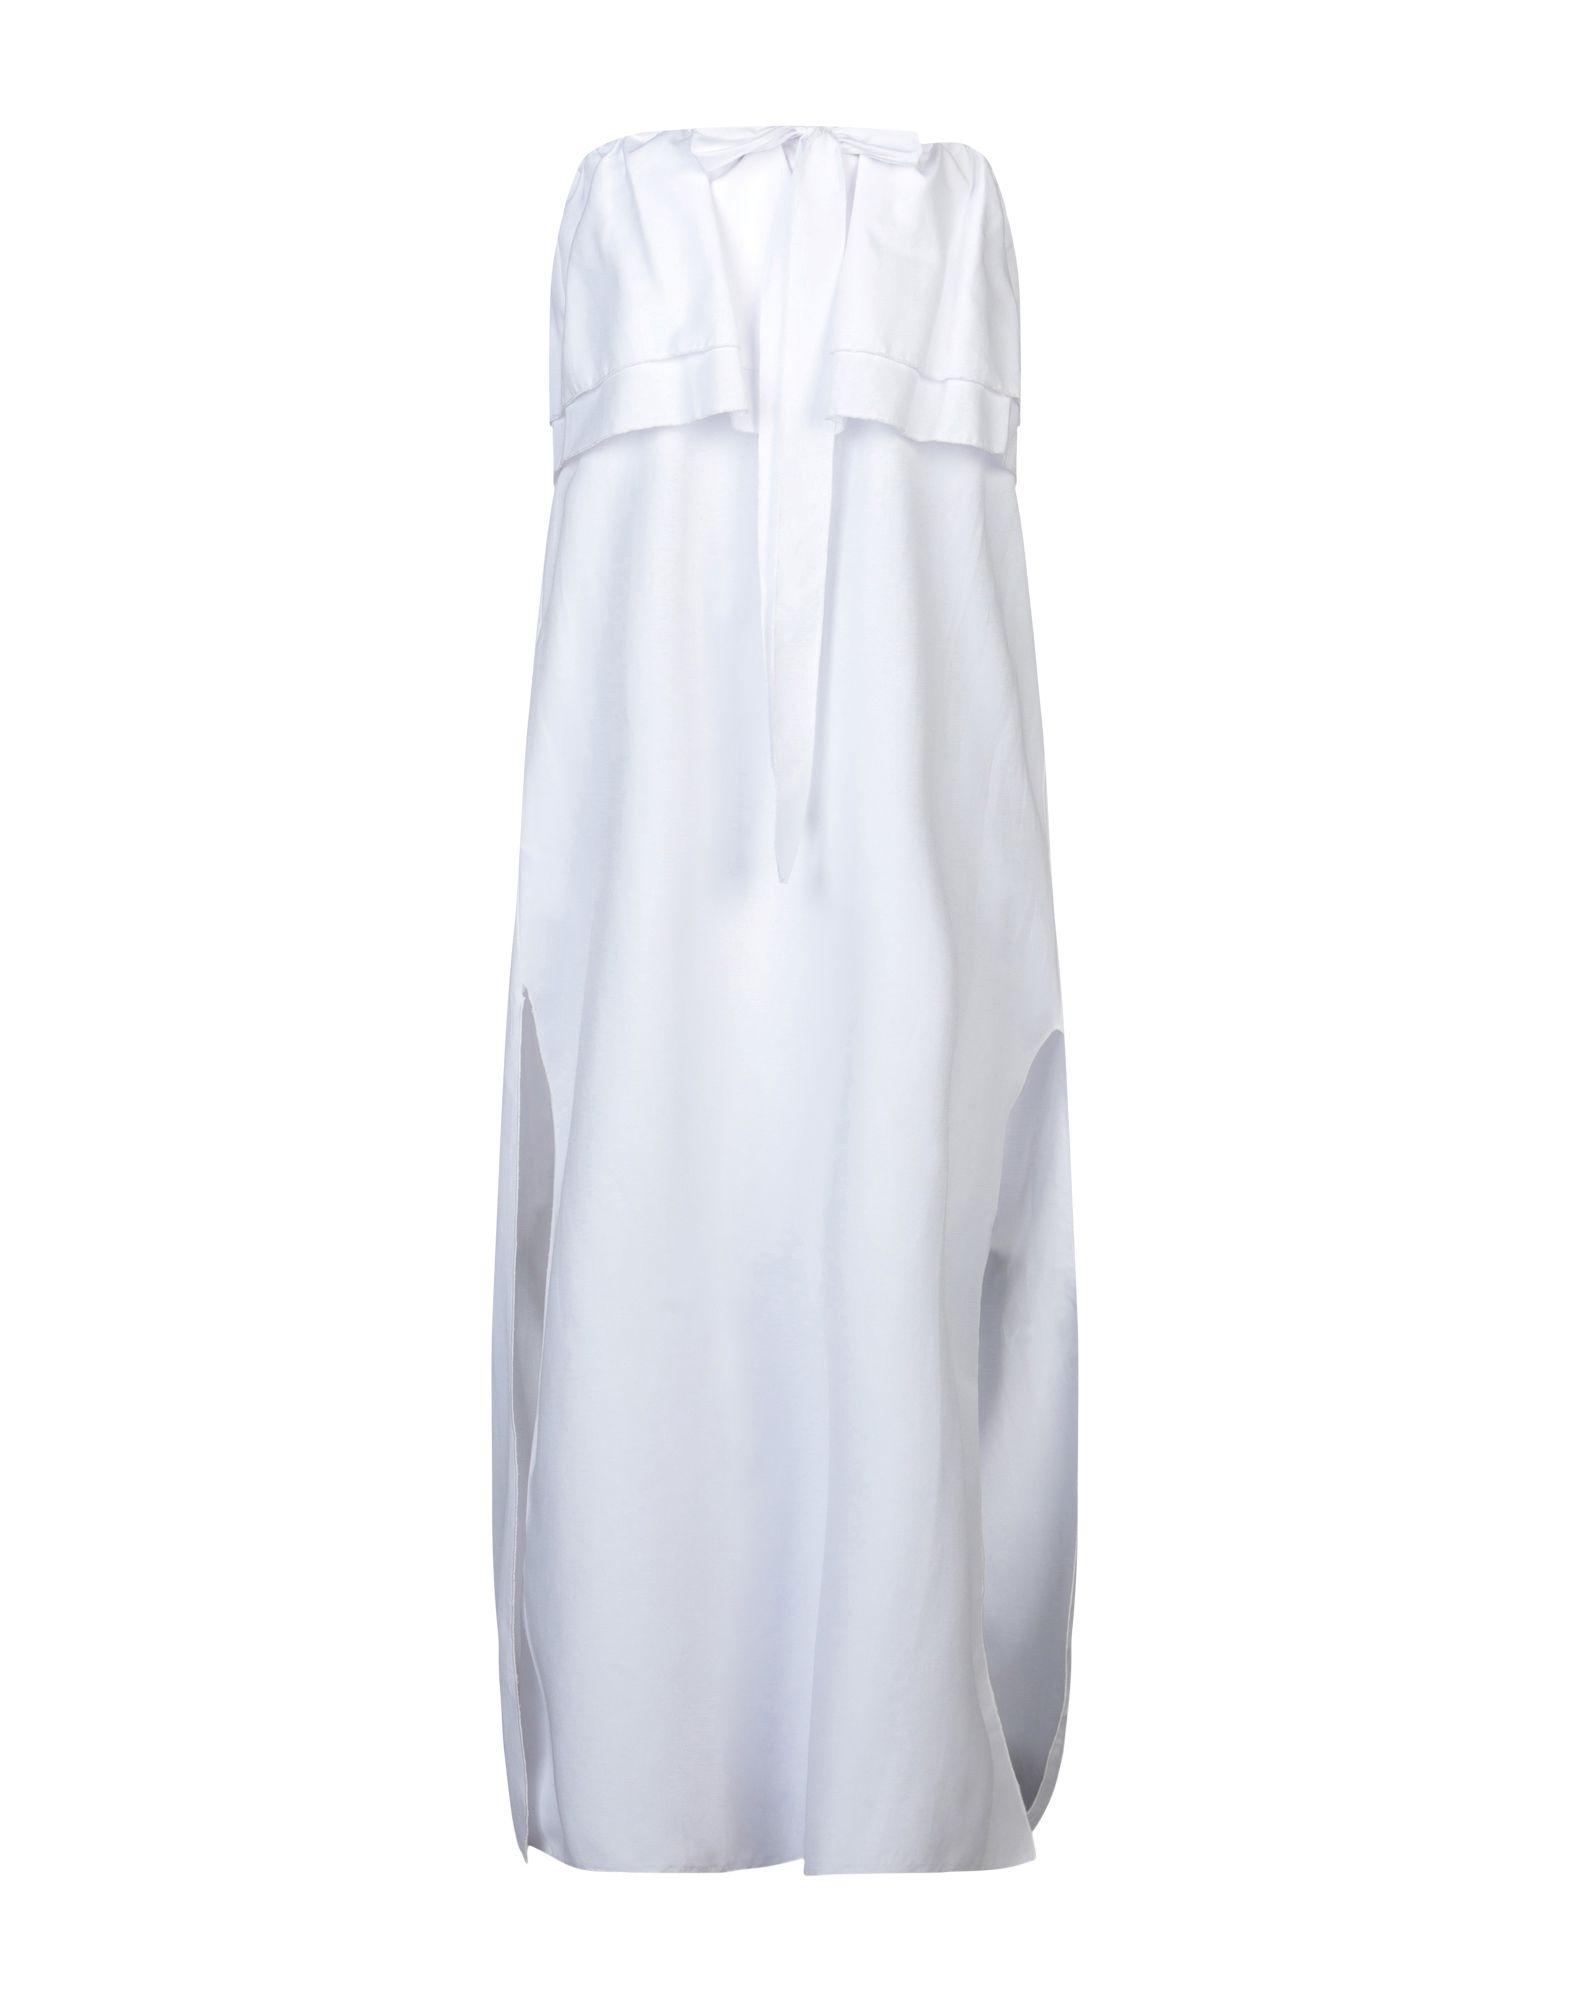 MILLE 968 Платье длиной 3/4 hot new golf clubs putter ghost tour daytona12 golf putter 33 34 35 steel shaft with putter headcovers ems free shipping